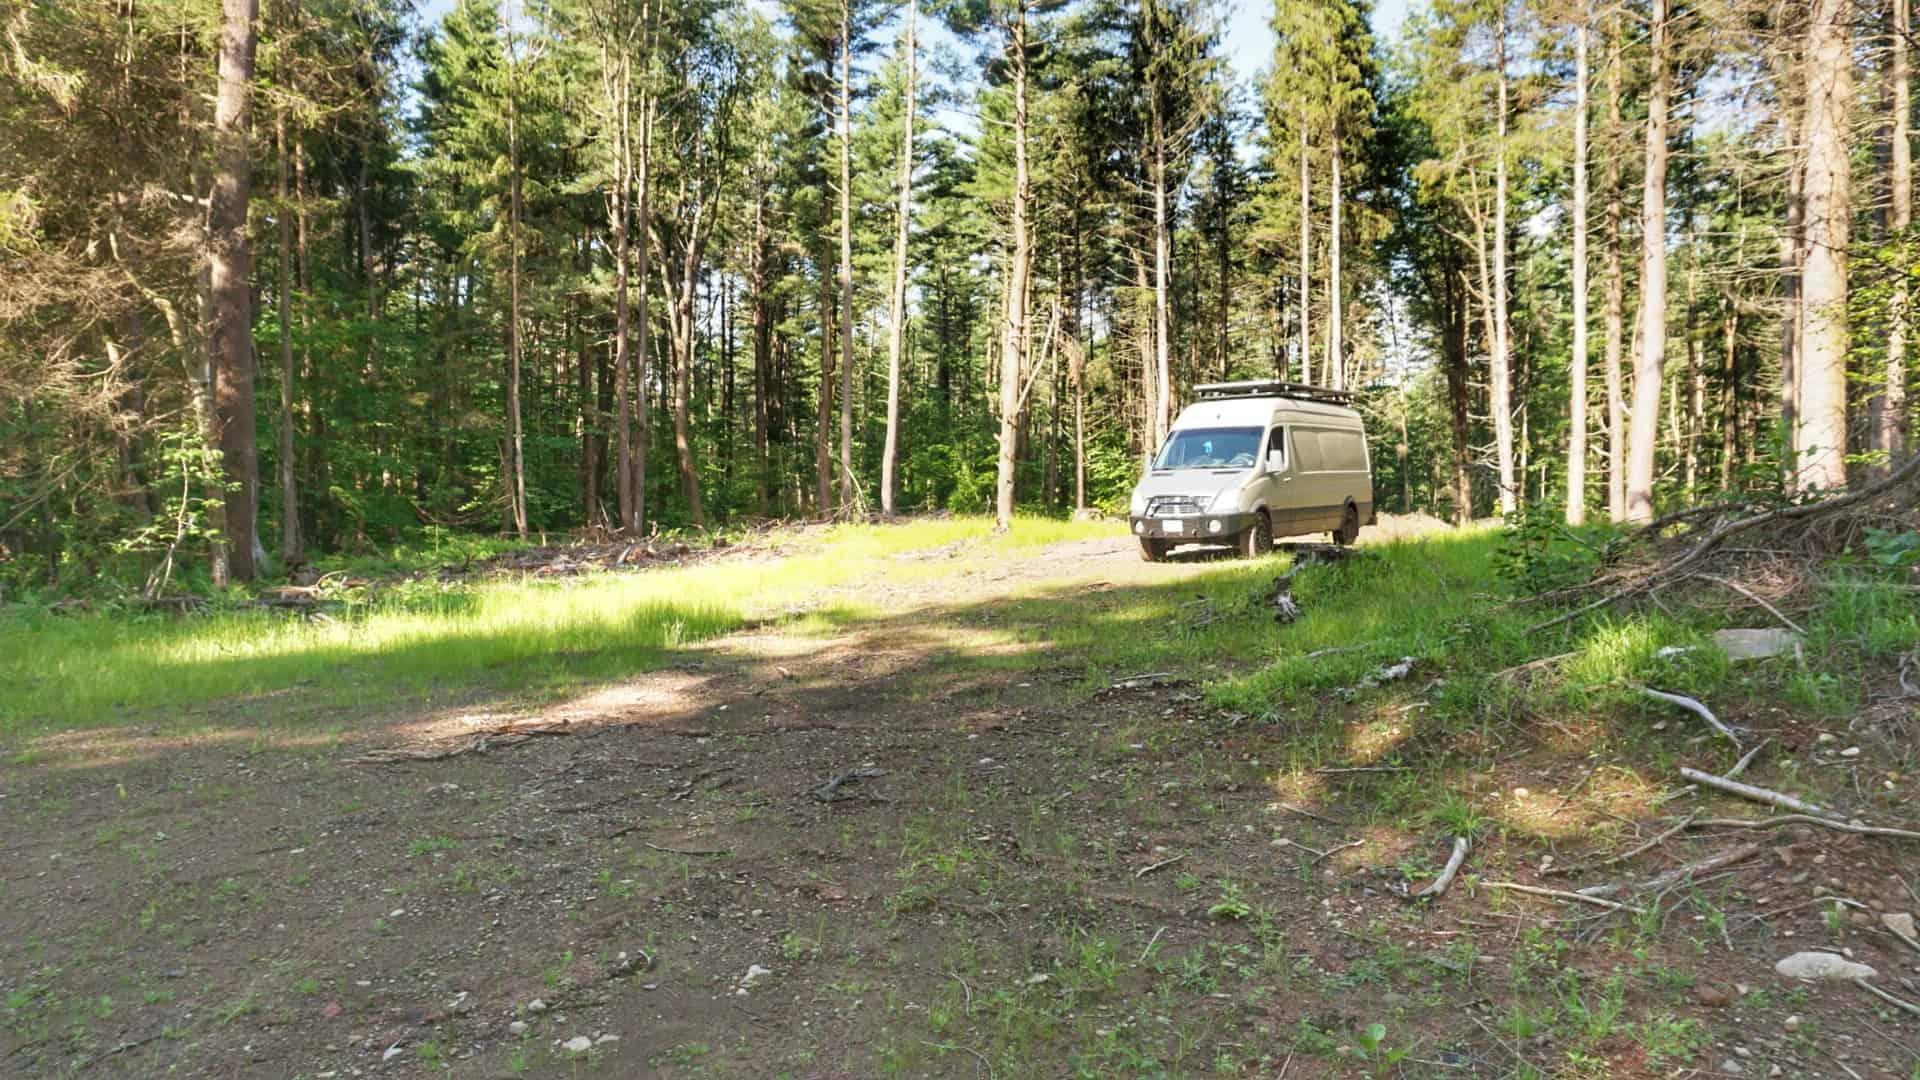 Winona State Forest Primitive Camping